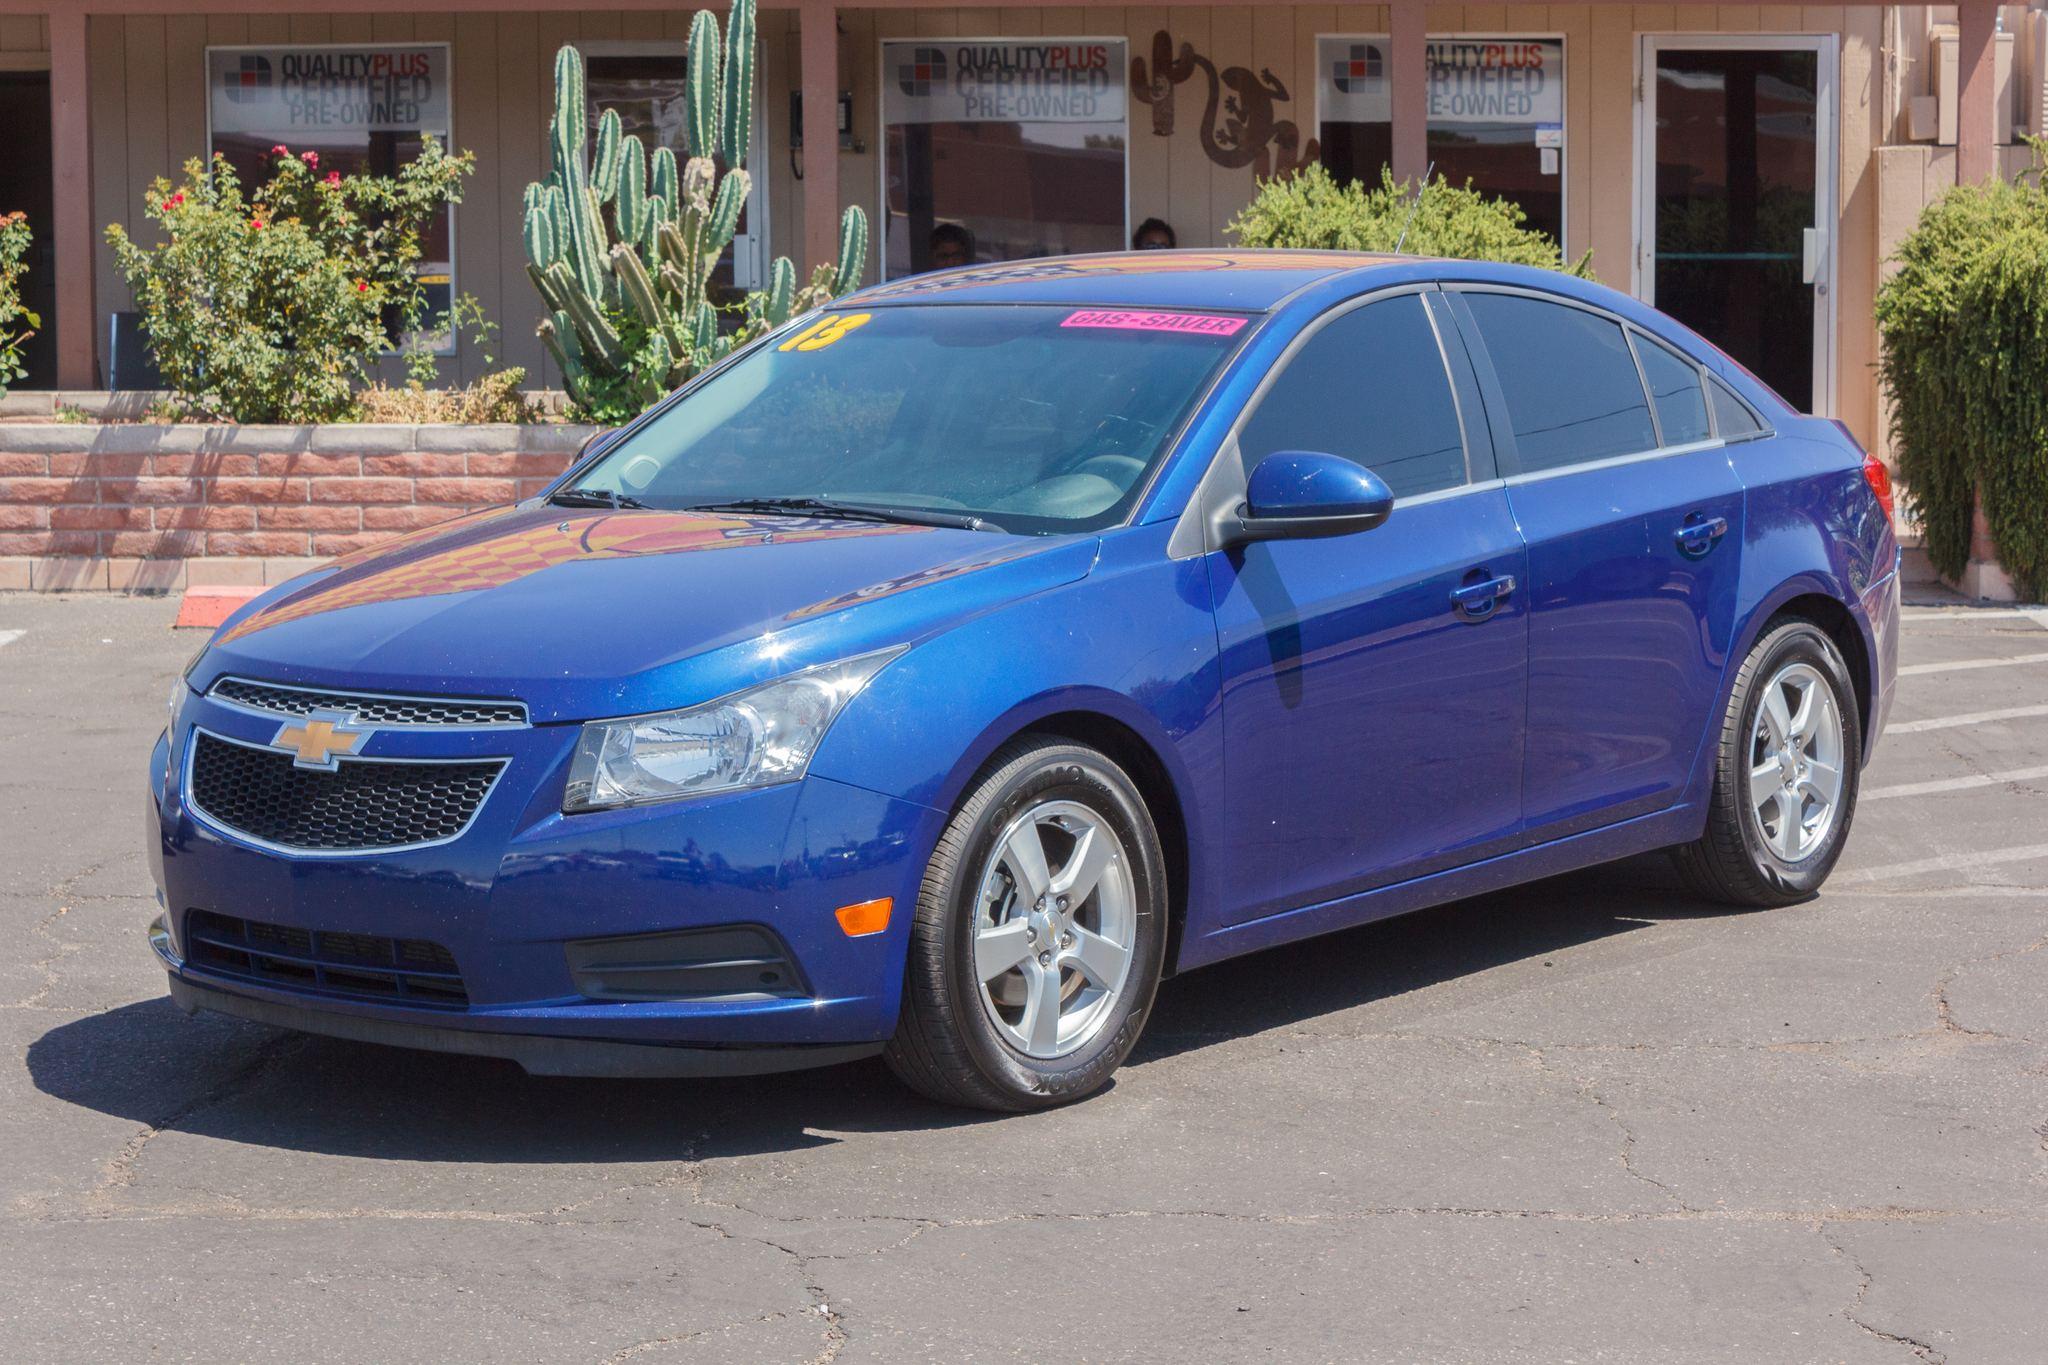 Photo of 2013 Chevrolet Cruze 4d Sedan LT w/1FL Blue Topaz Metallic